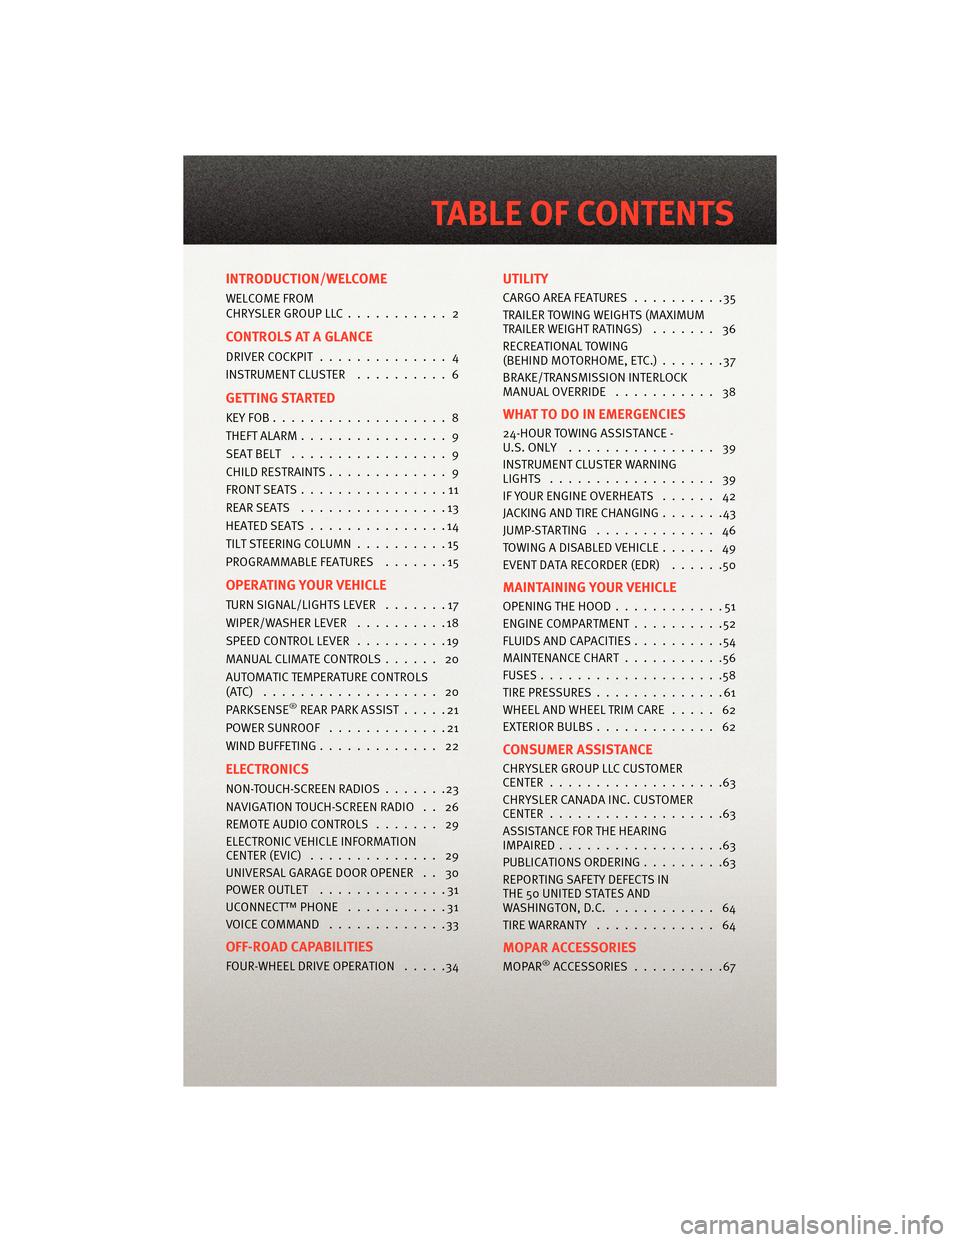 dodge nitro service manual pdf